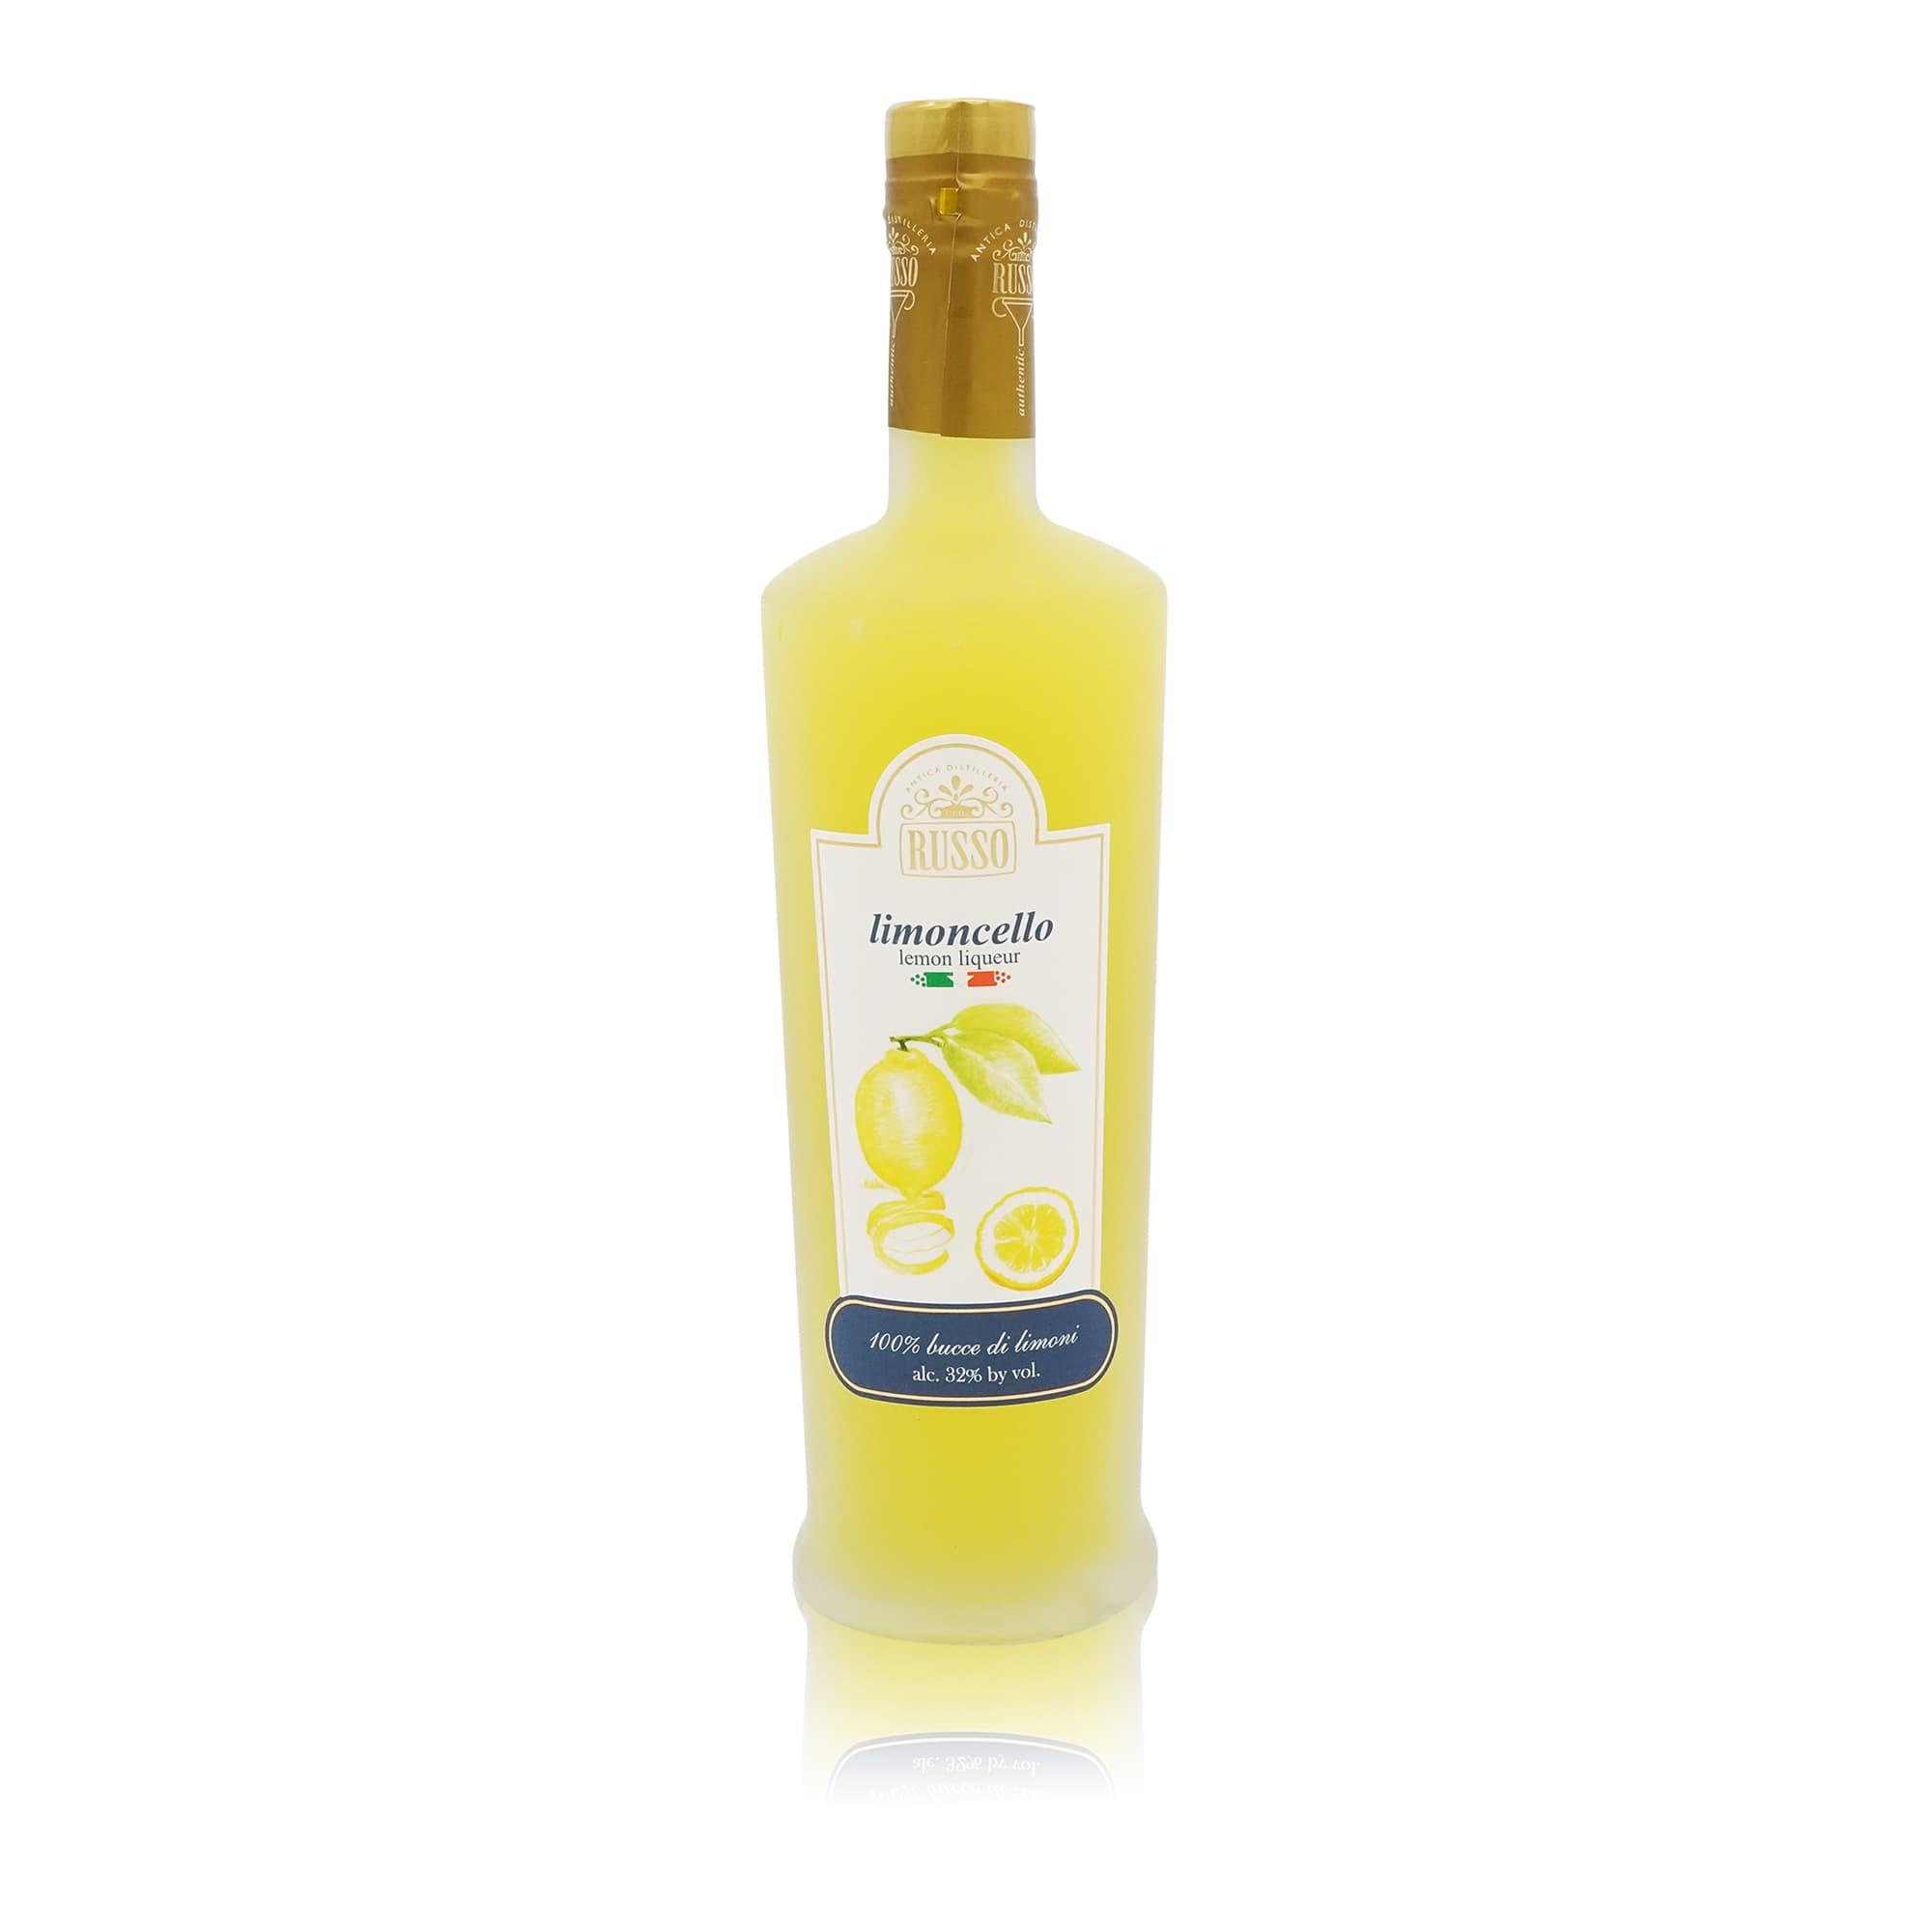 limoncello original italienischer